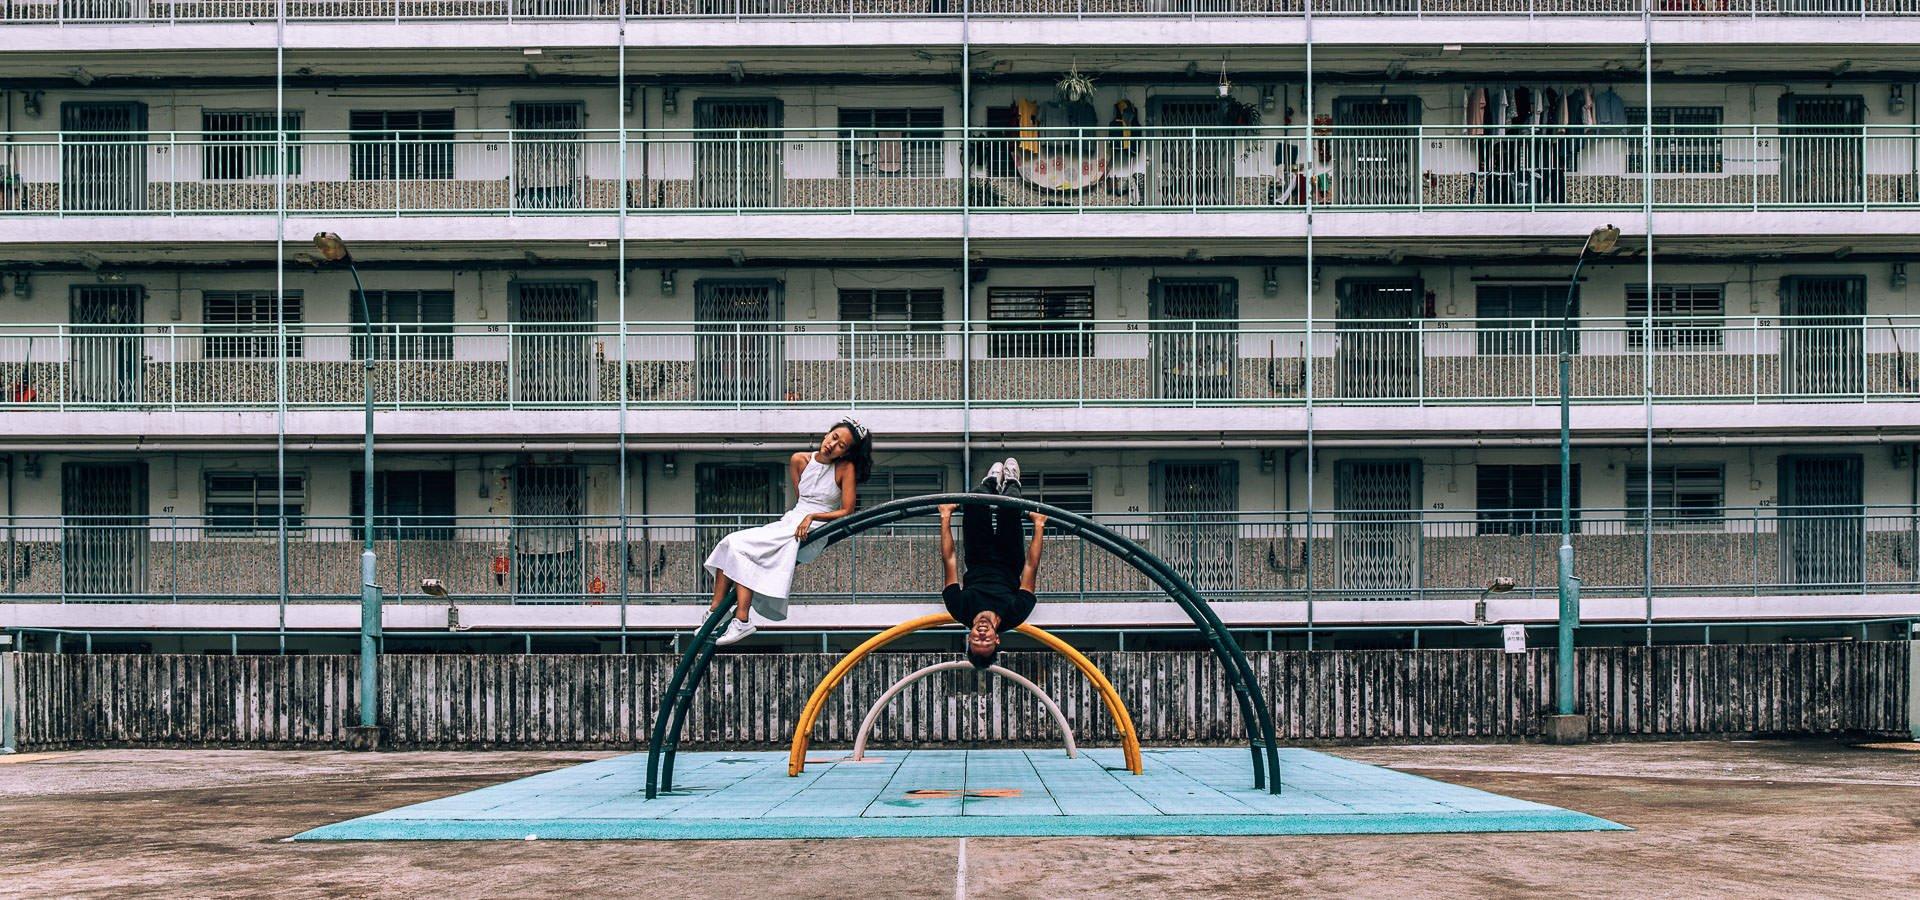 15 Top Places For Hong Kong Instagram Shots | hong kong instagram 4